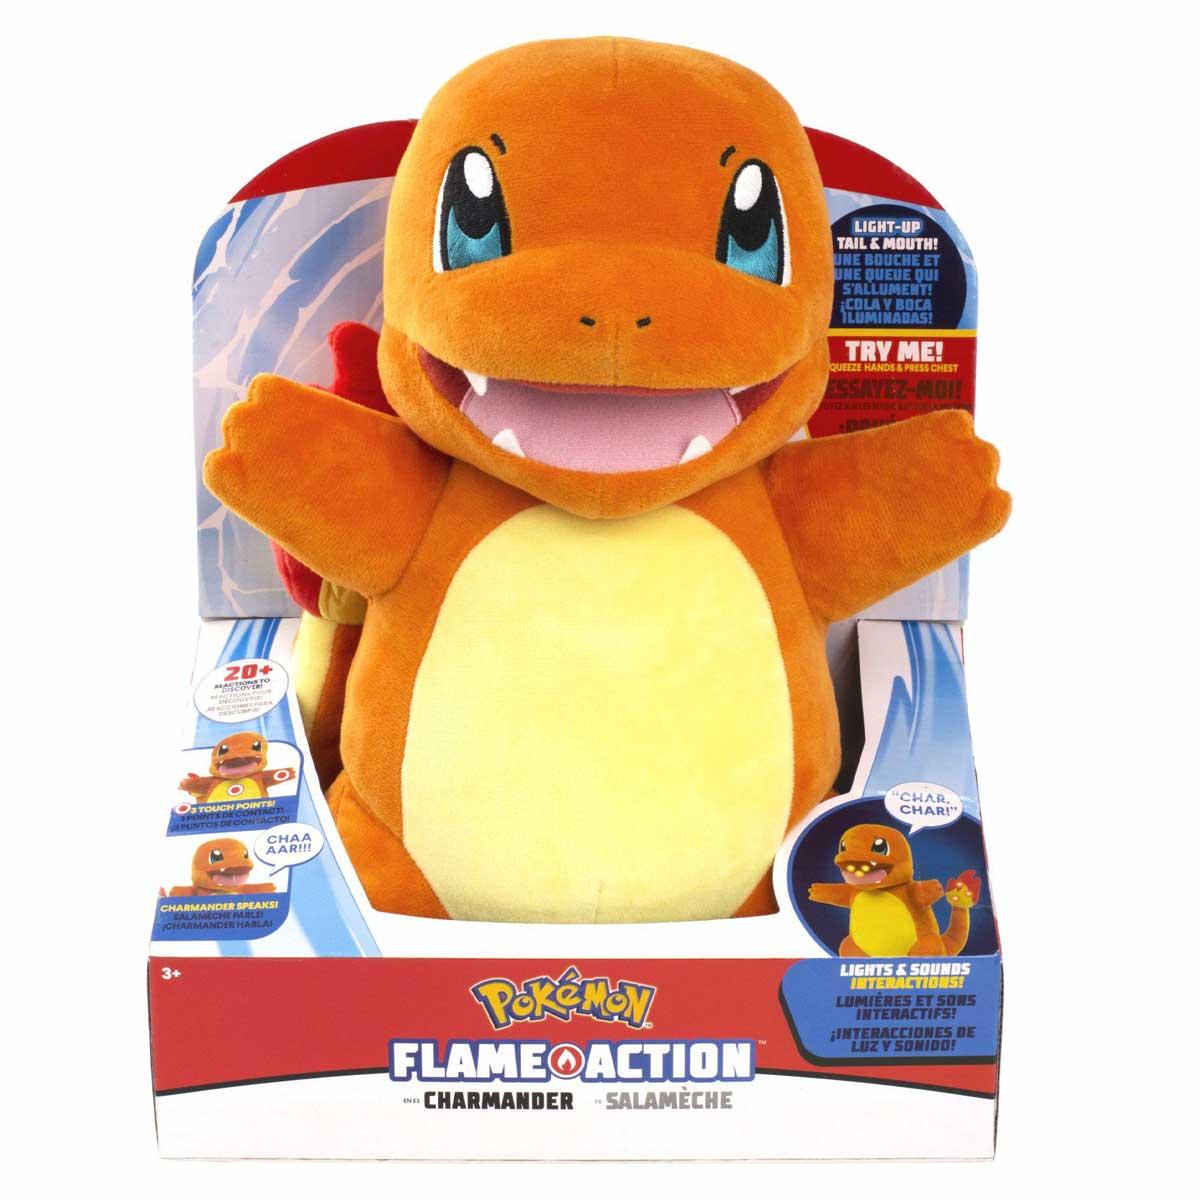 Pokémon, Flame Action Charmander